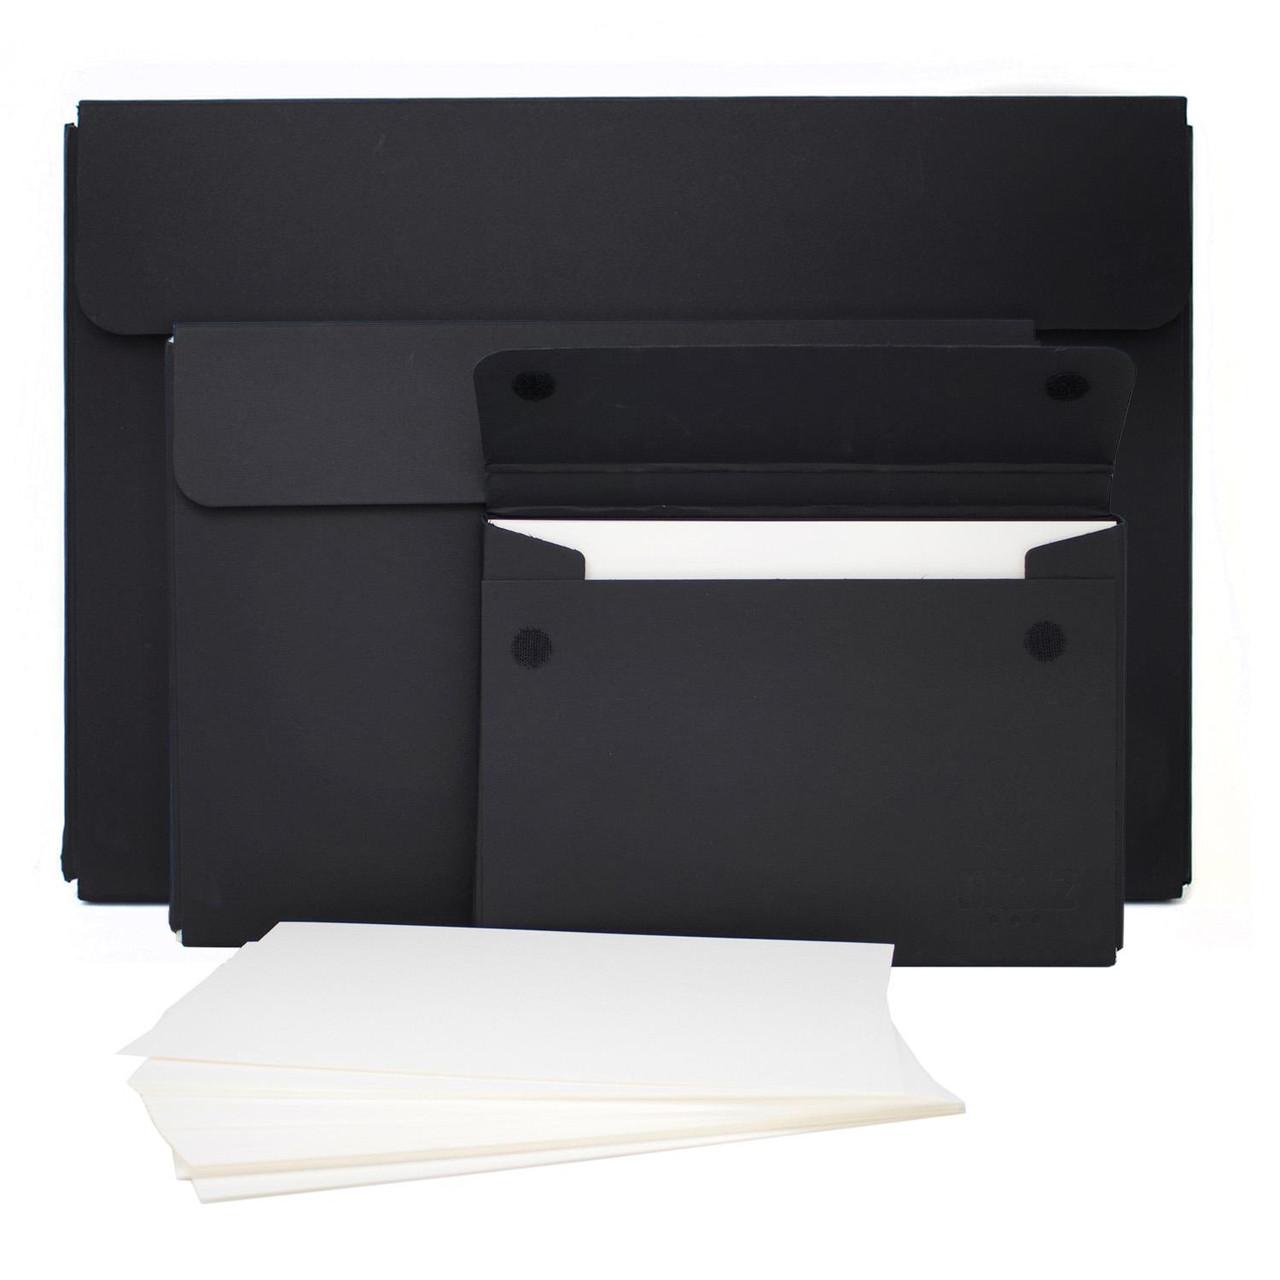 240gsm Multi Art Premium Cartridge Paper Pack A2-100 Sheets Artway MRKZ